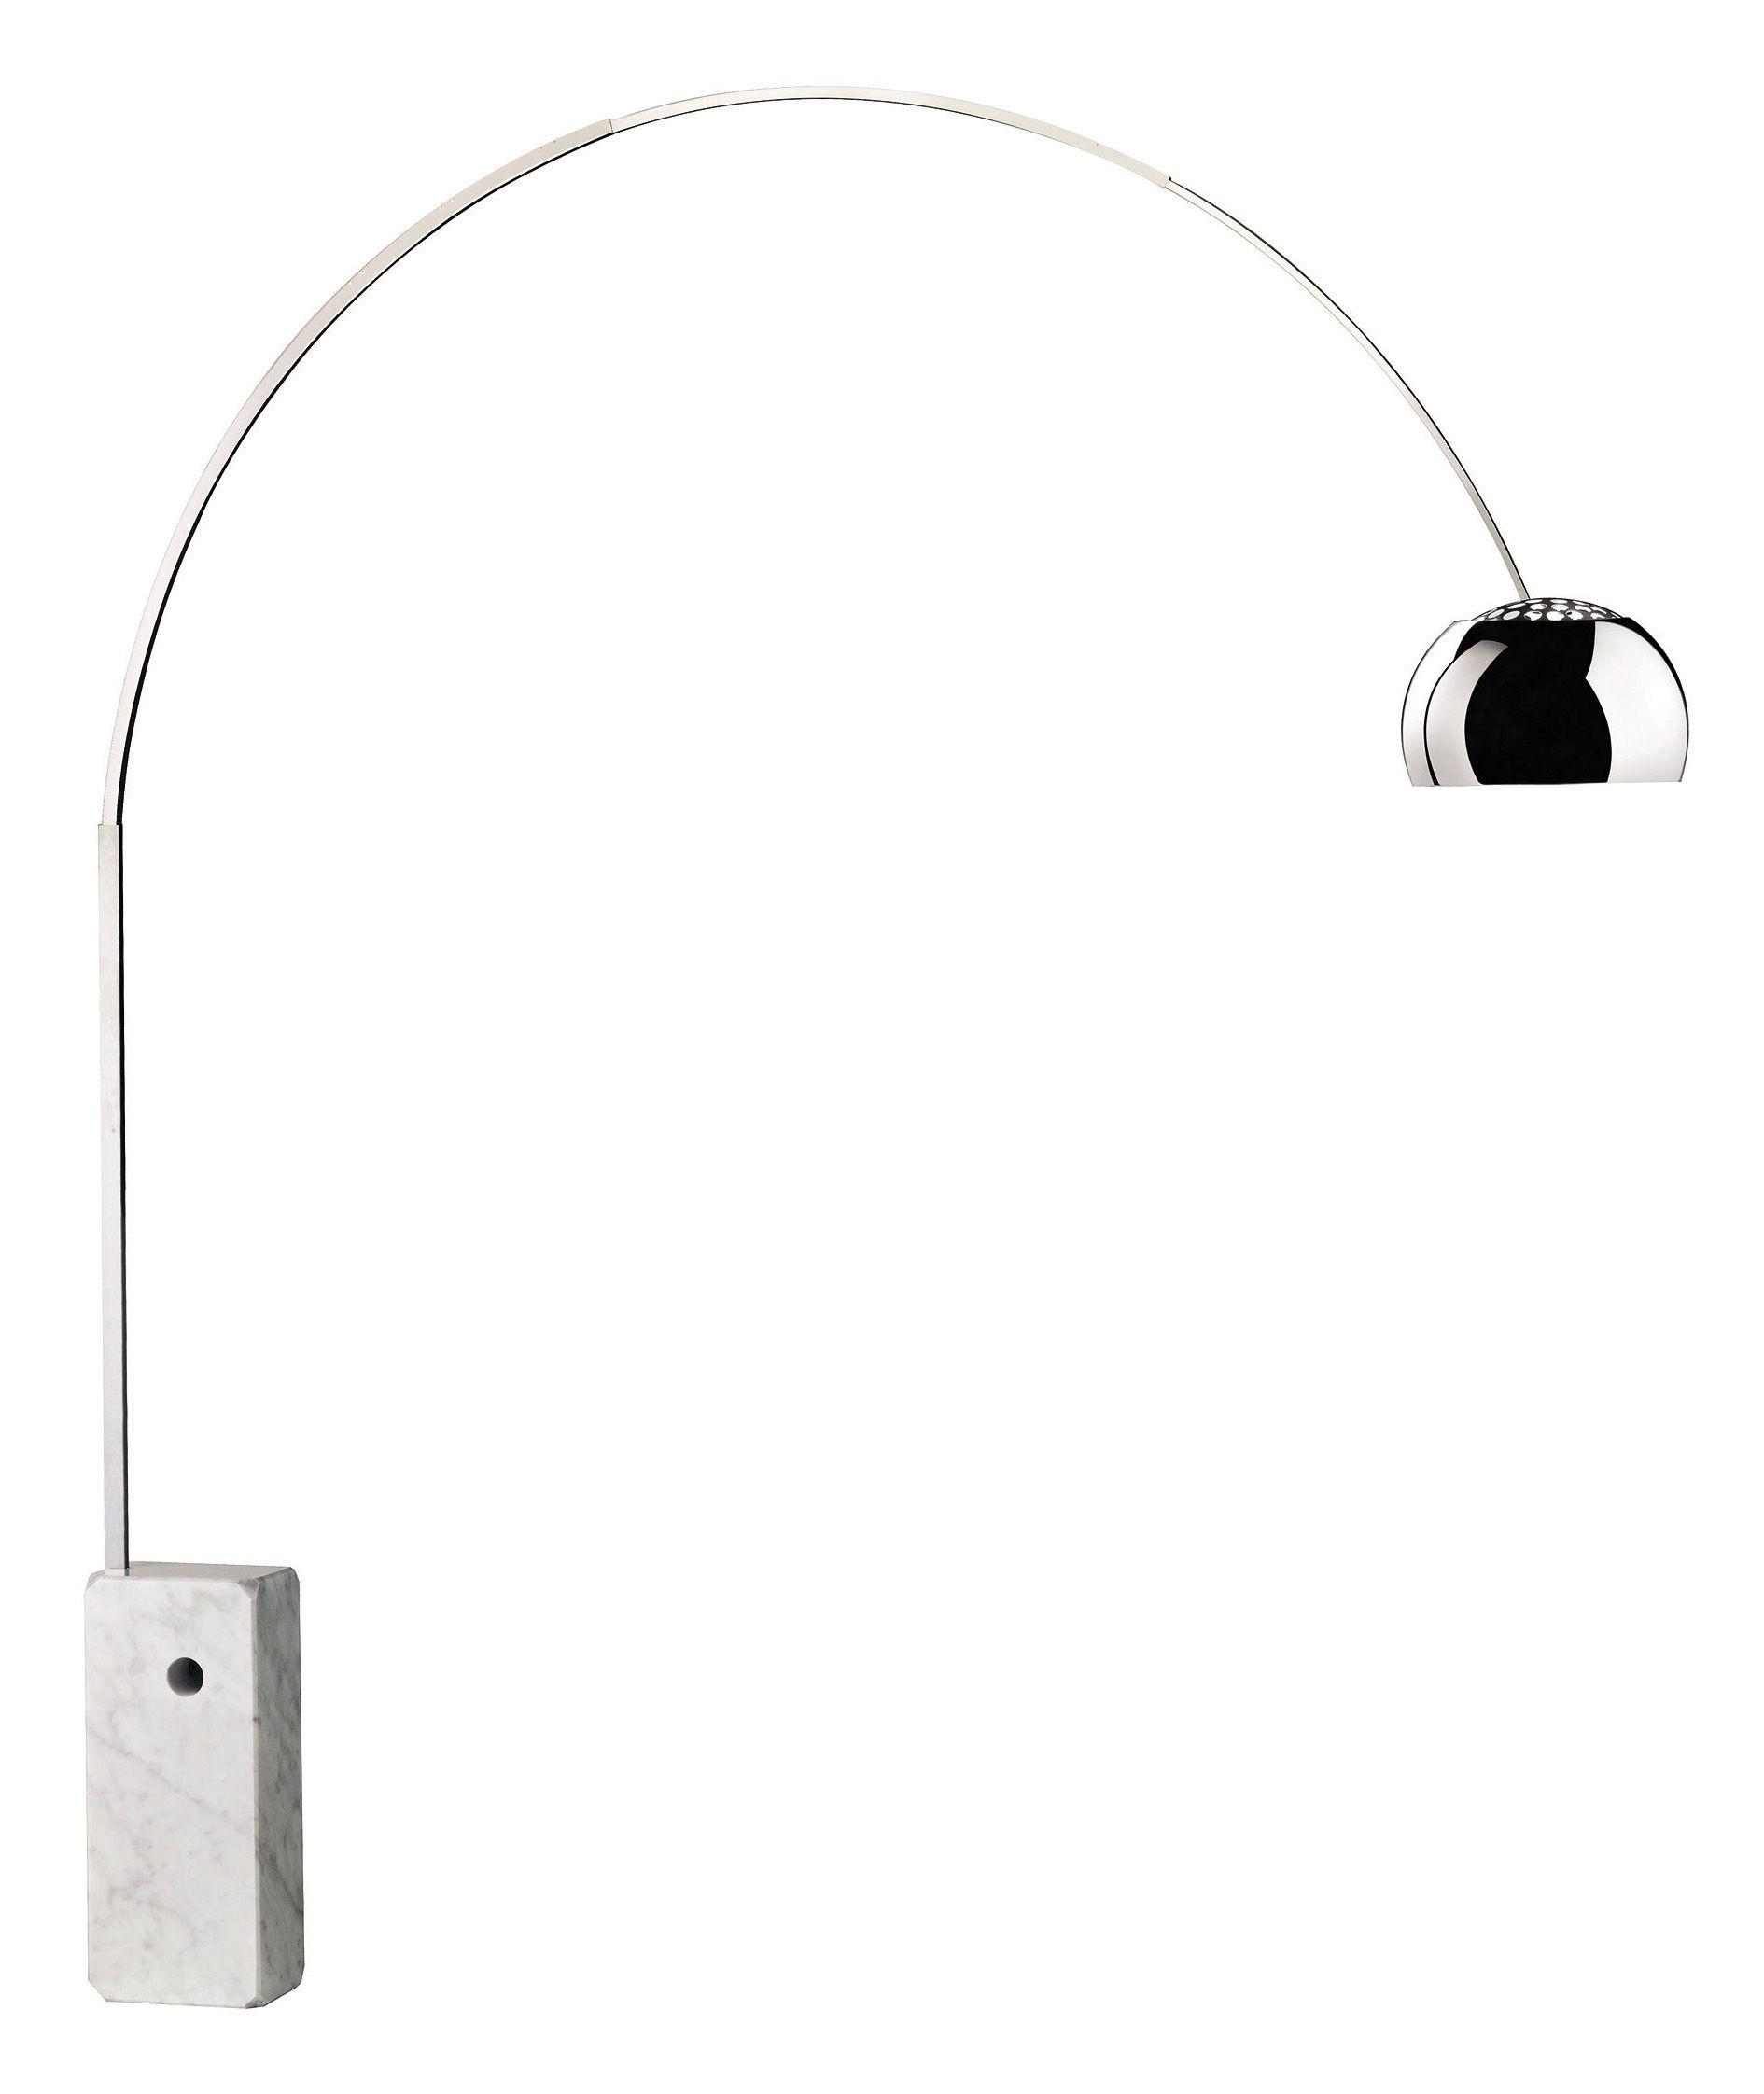 Luminaire - Lampadaires - Lampadaire Arco H 240 cm - Flos - Marbre blanc - structure acier e - Acier inoxydable, Aluminium poli, Marbre